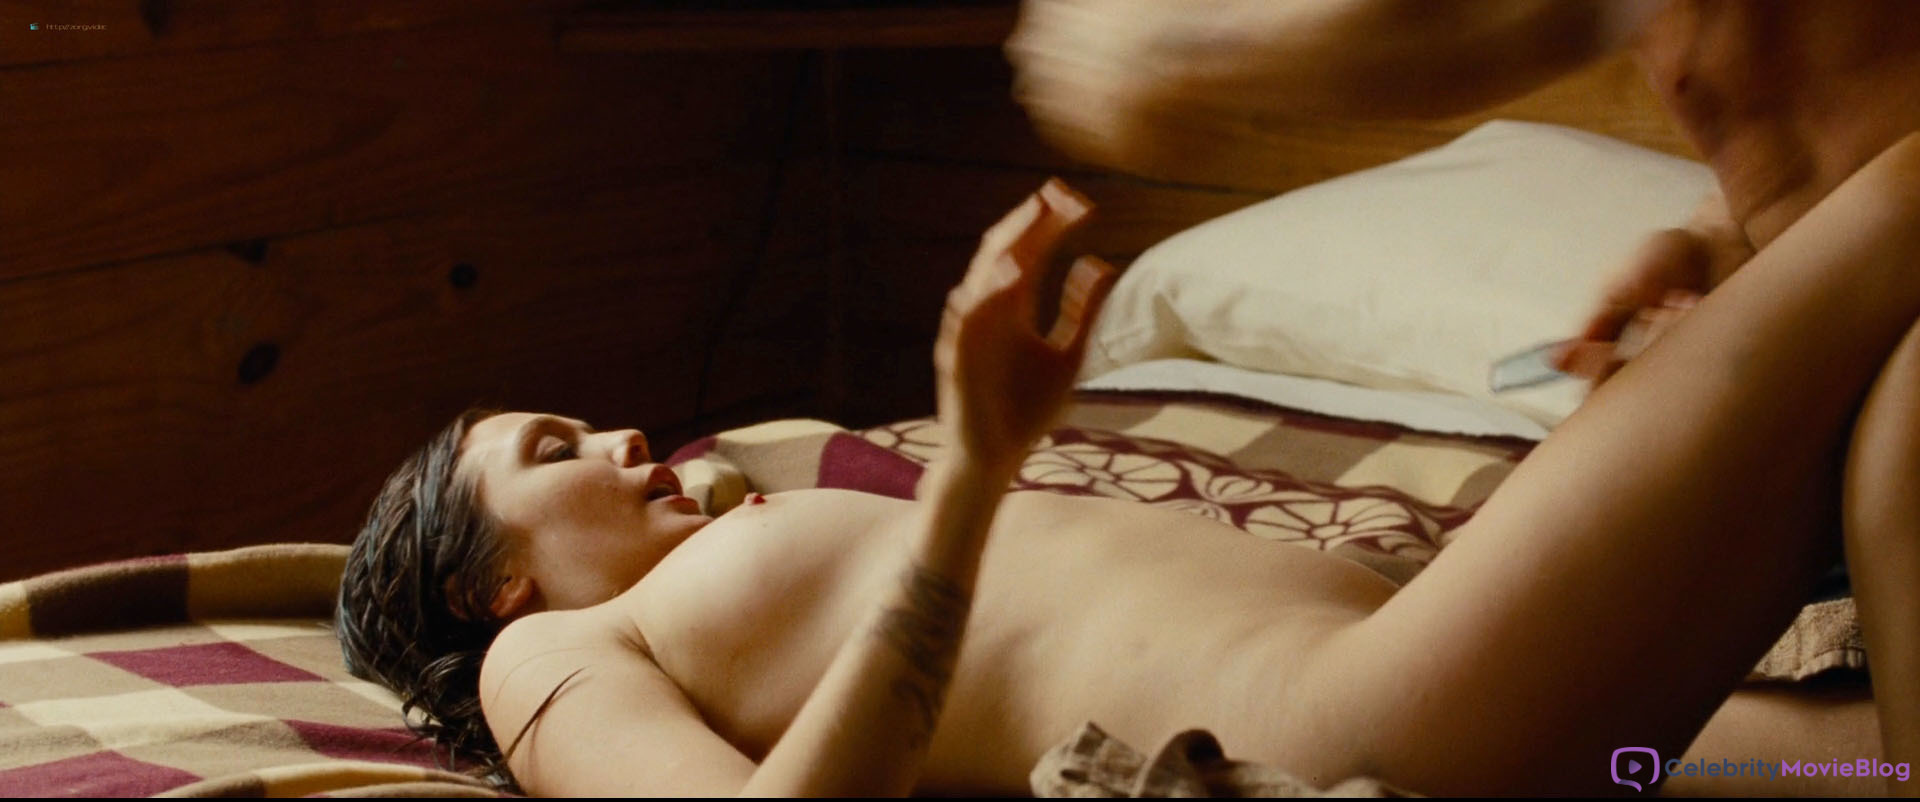 Elizabeth Olsen Nude Scenes photo 21